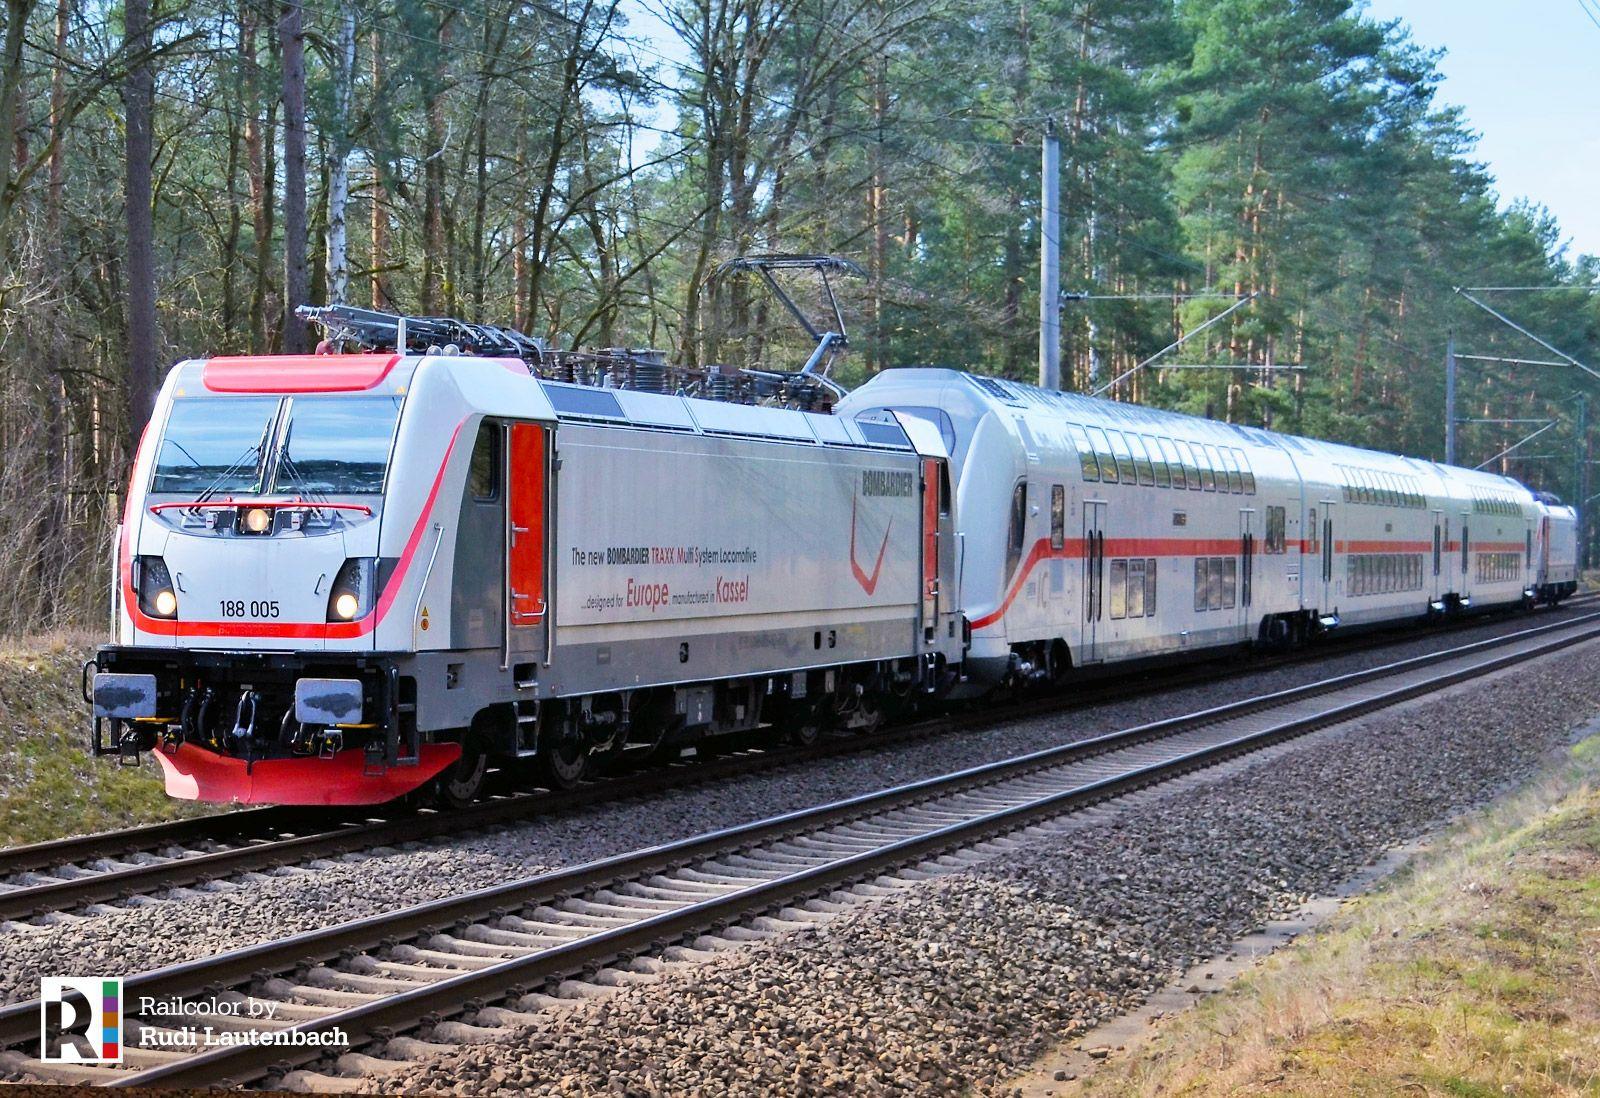 DE] TRAXX MS3 electrics enter the German rail network